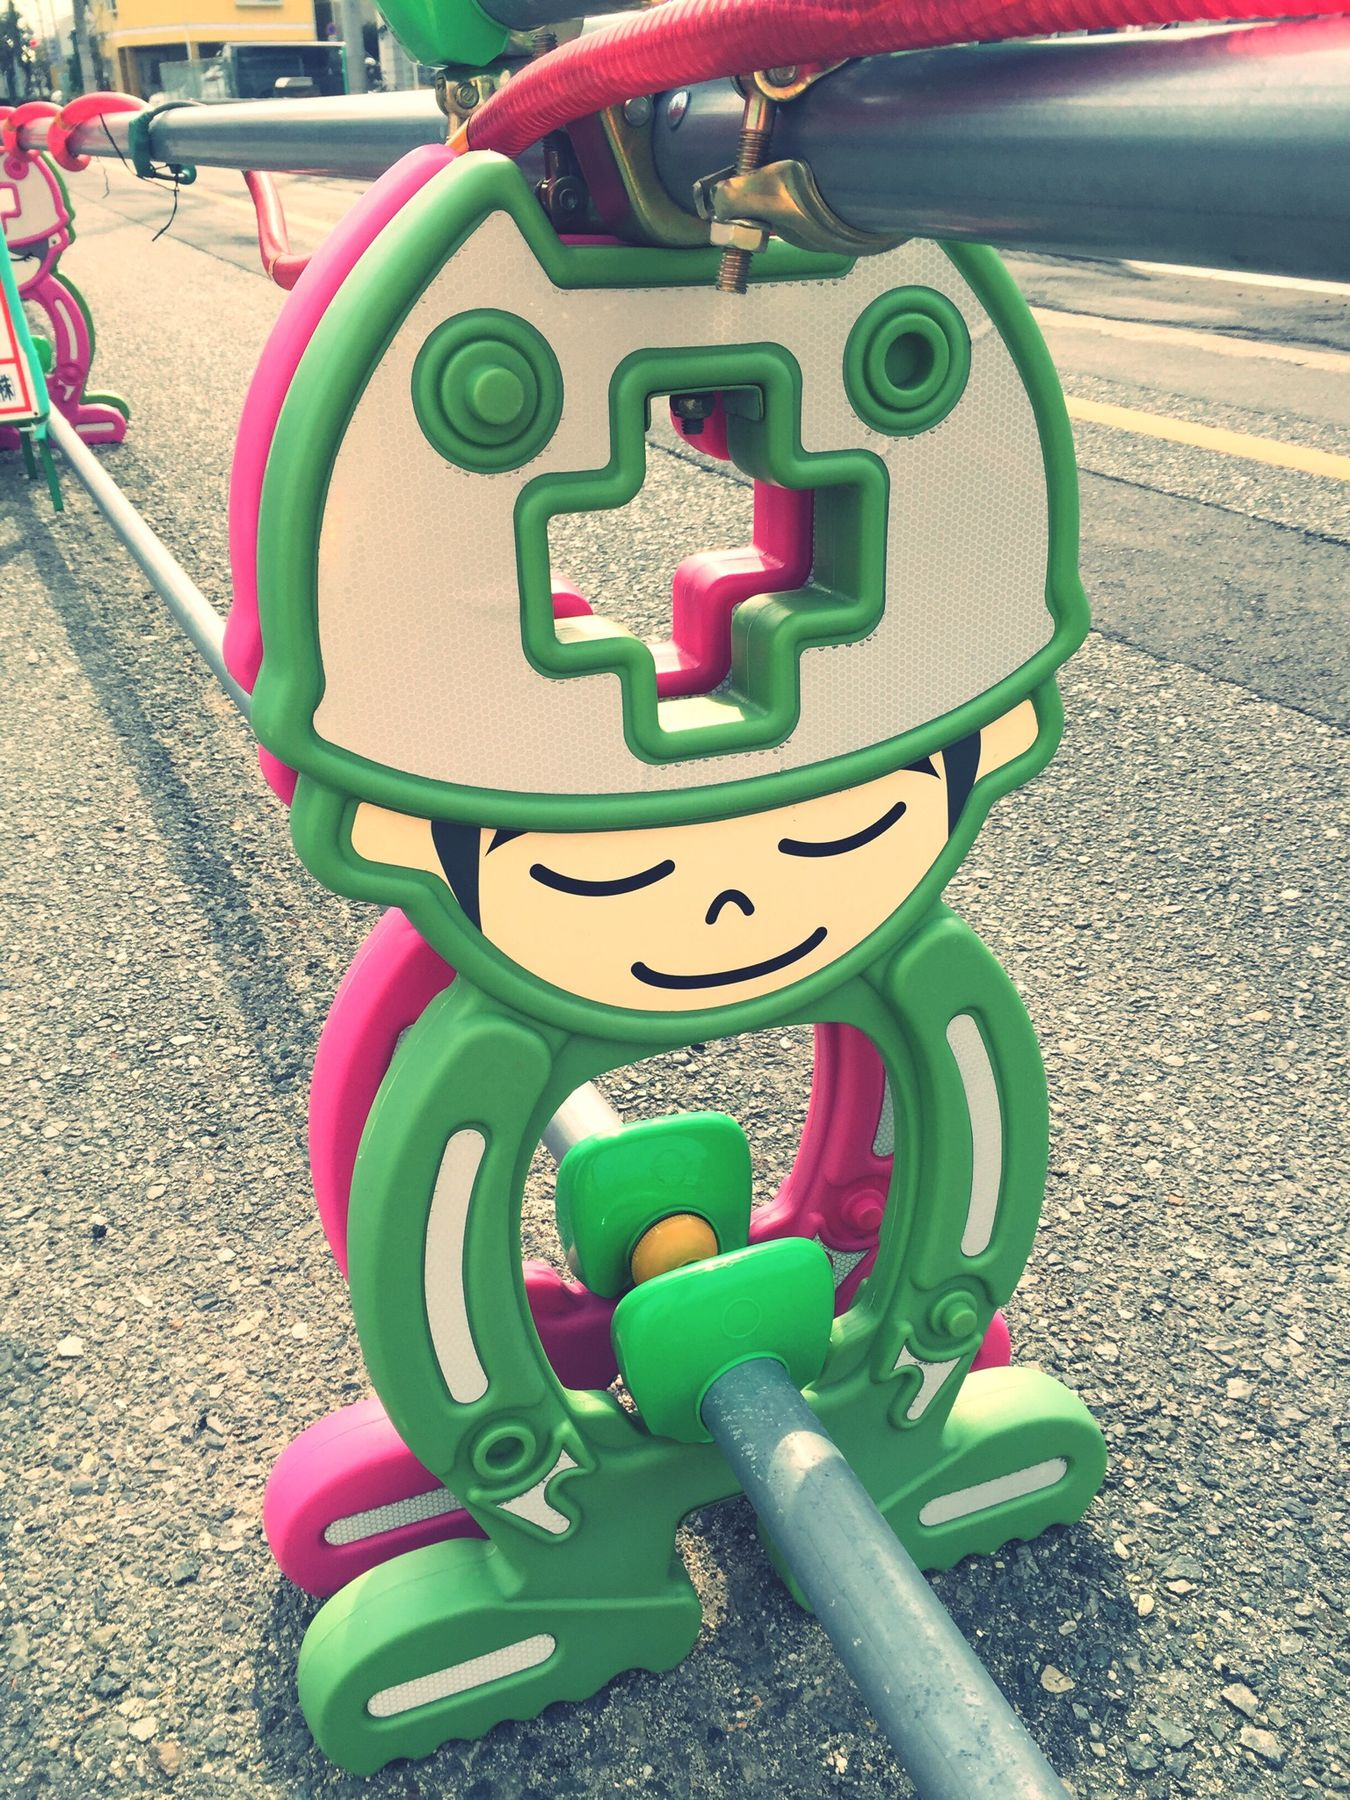 Construction Fence Boy Green Cute Kawaii💕 工事のフェンス EyeEm EyeEmJapan Hello World Iphone 6 EyeEm Daily 道路工事 Taking Photos By Me